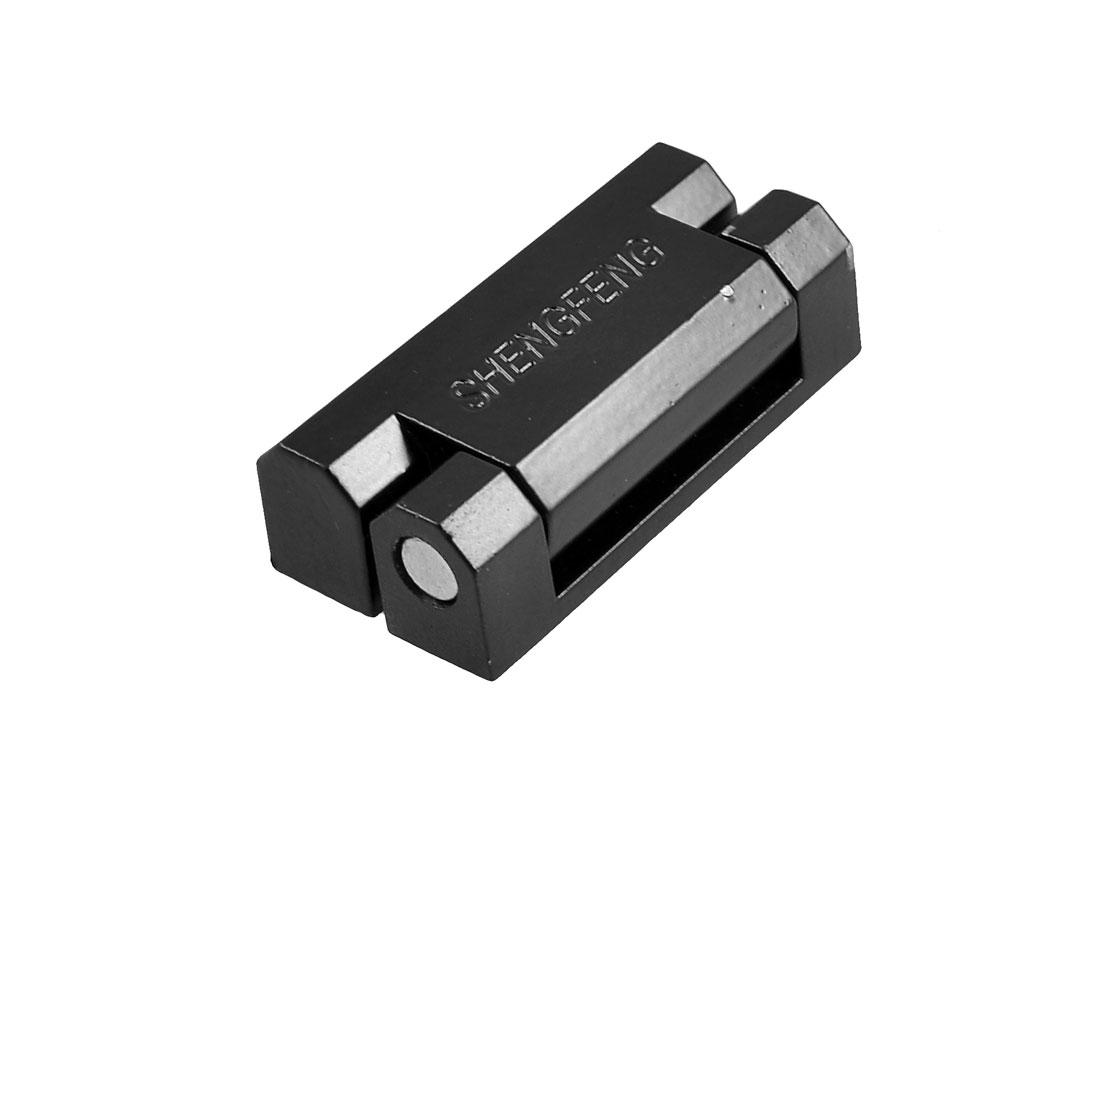 CL735 Black Zinc Alloy 180 Degree Rotation Cabinet Door Hinge